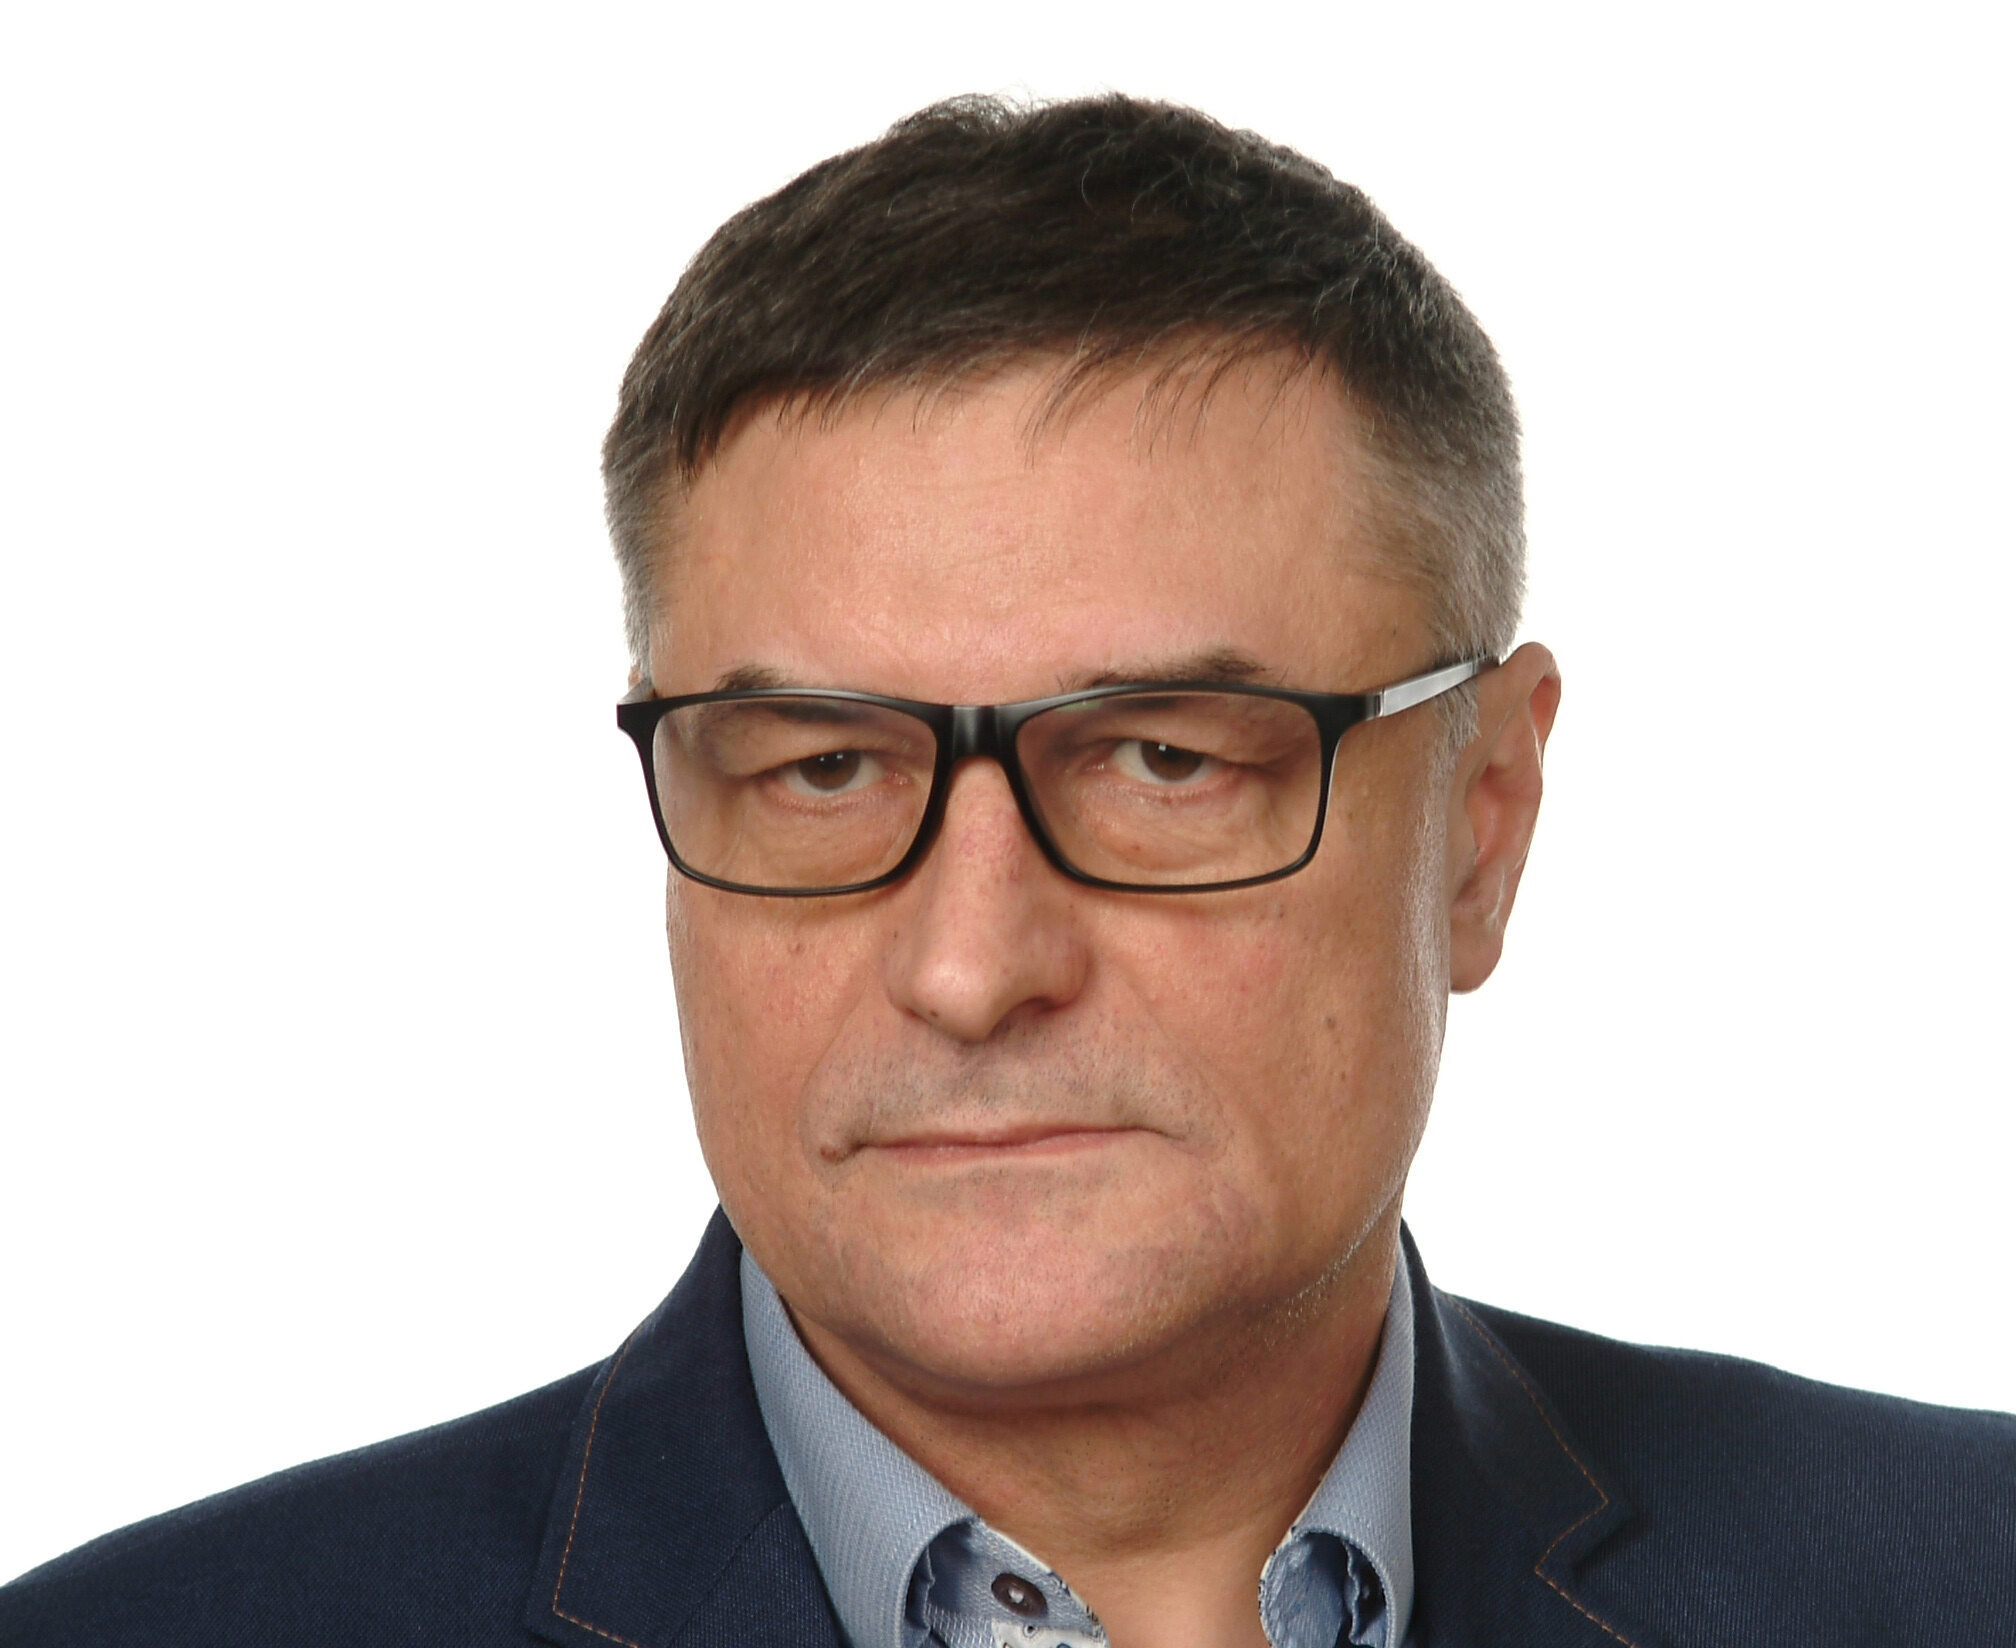 Juliusz Zielonka